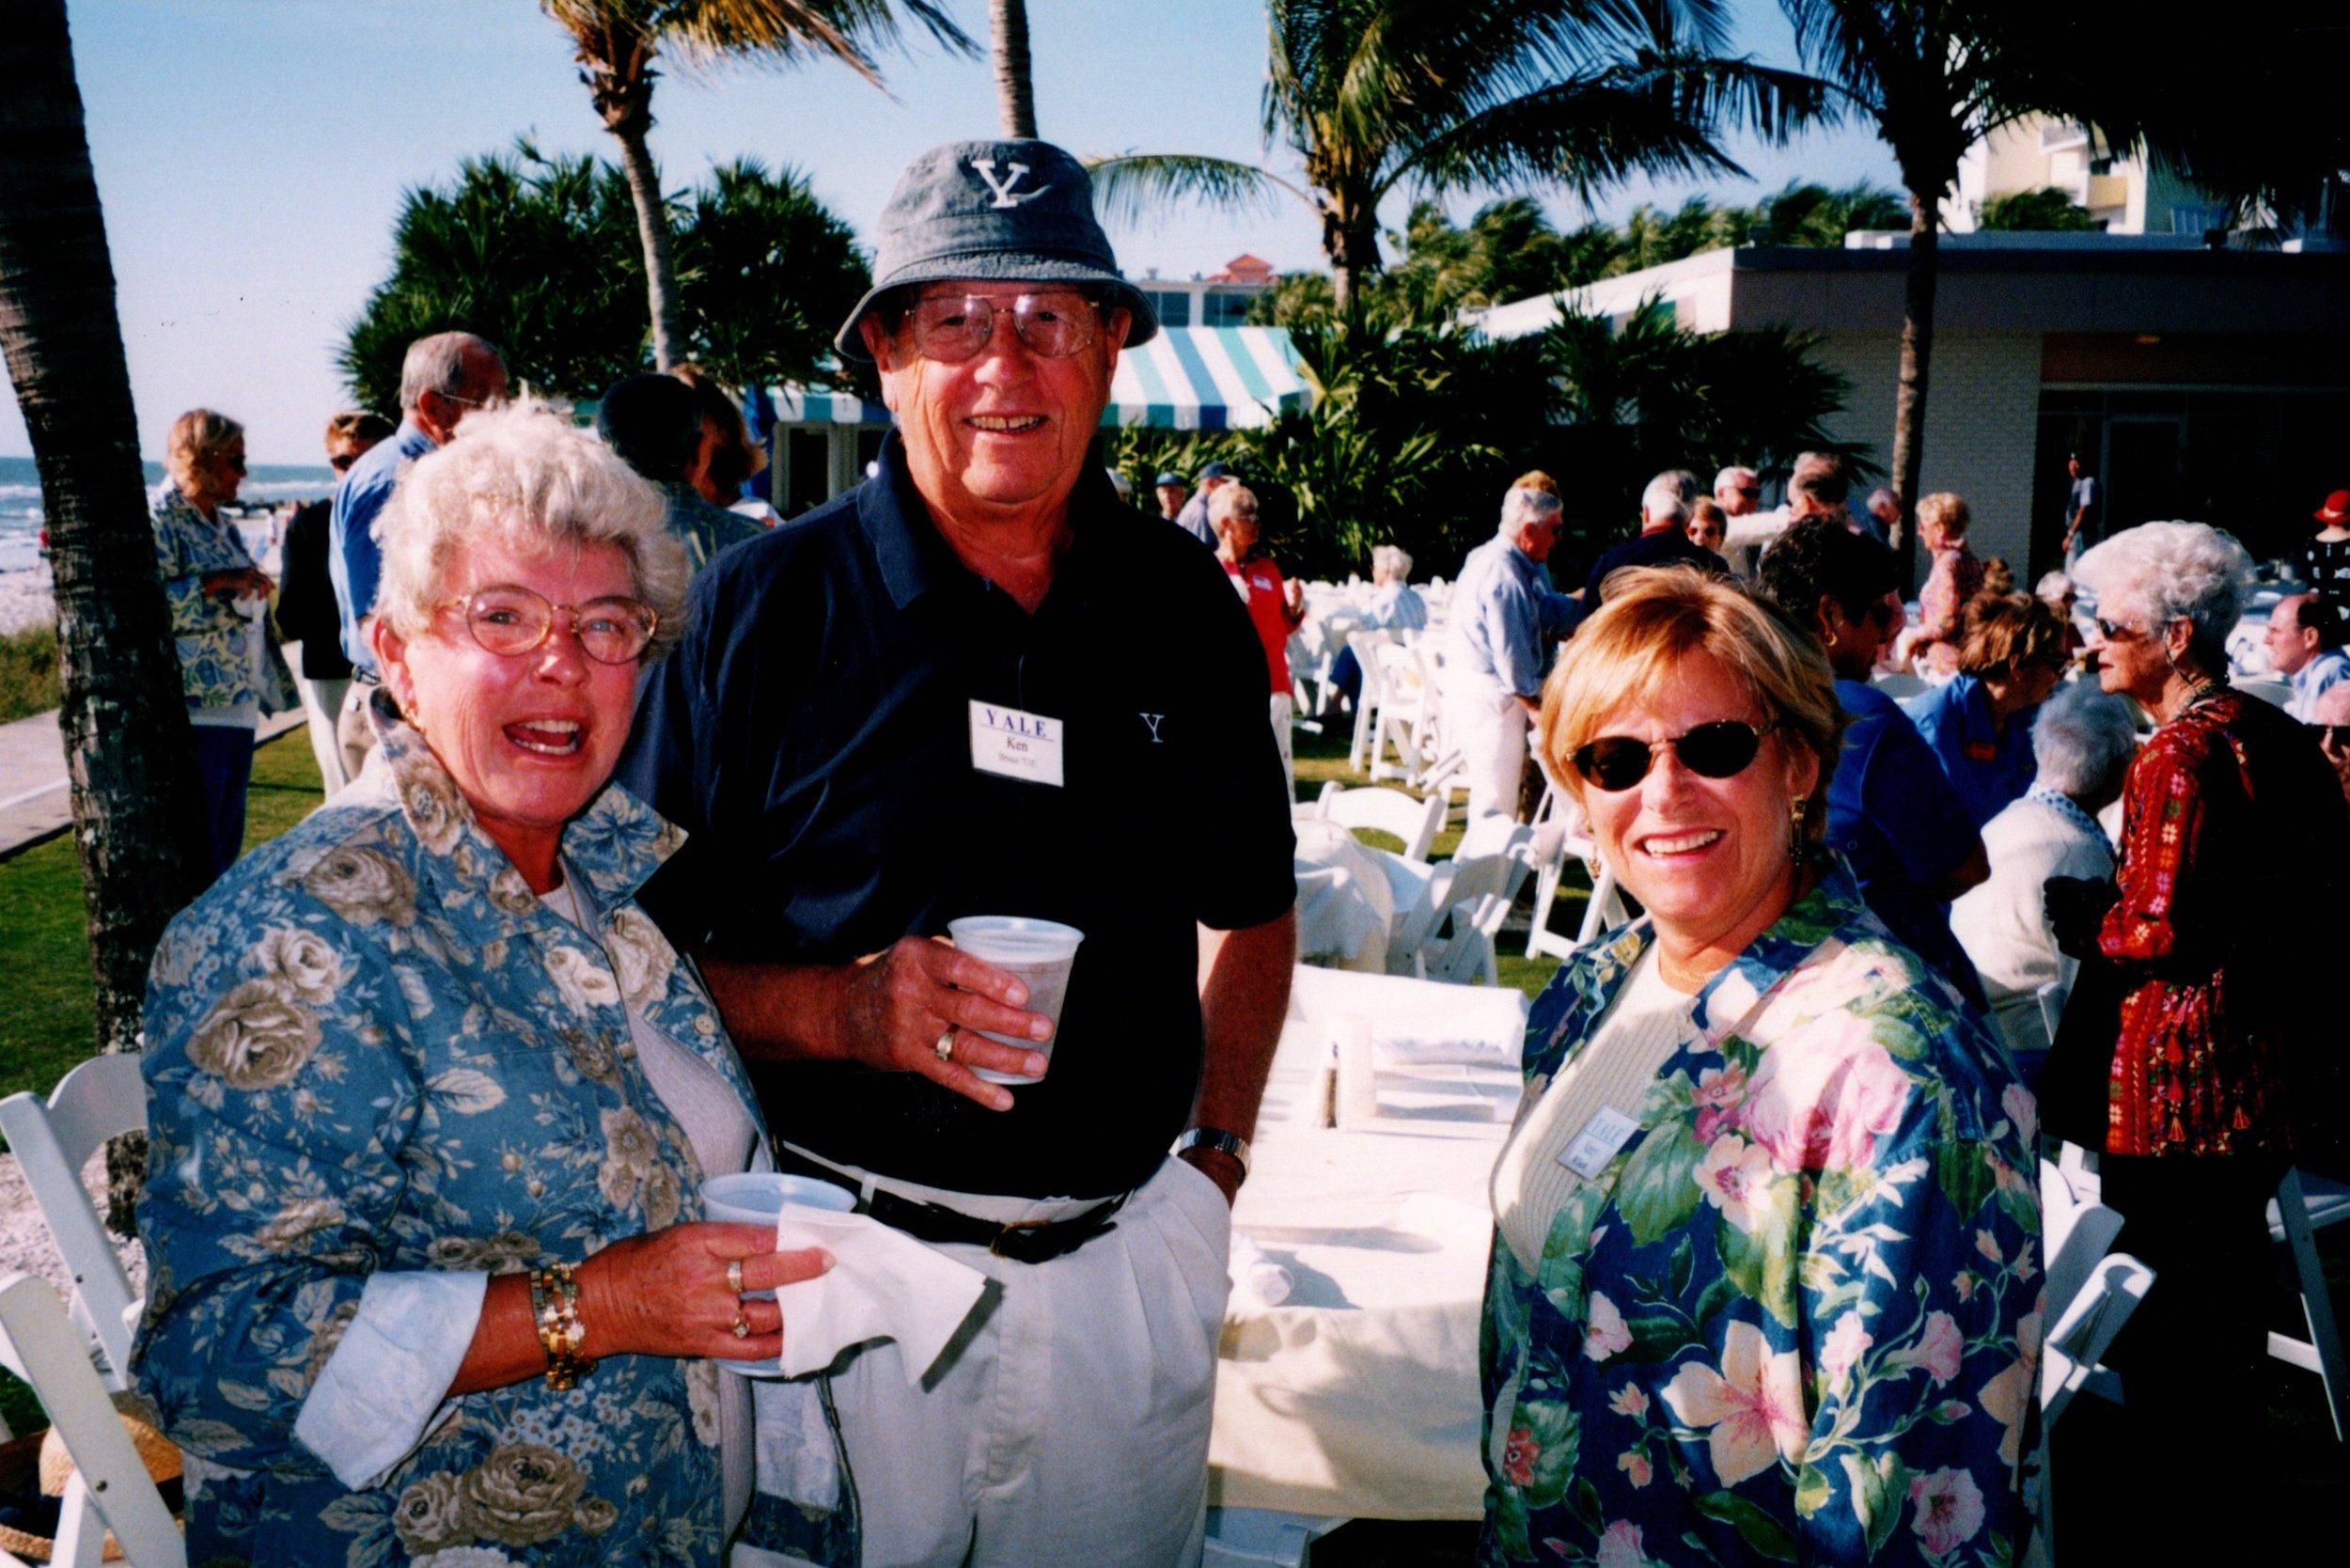 4_ 4_2004 - IVY LEAGUE PICNIC - NAPLES BEACH HOTEL 2.jpg